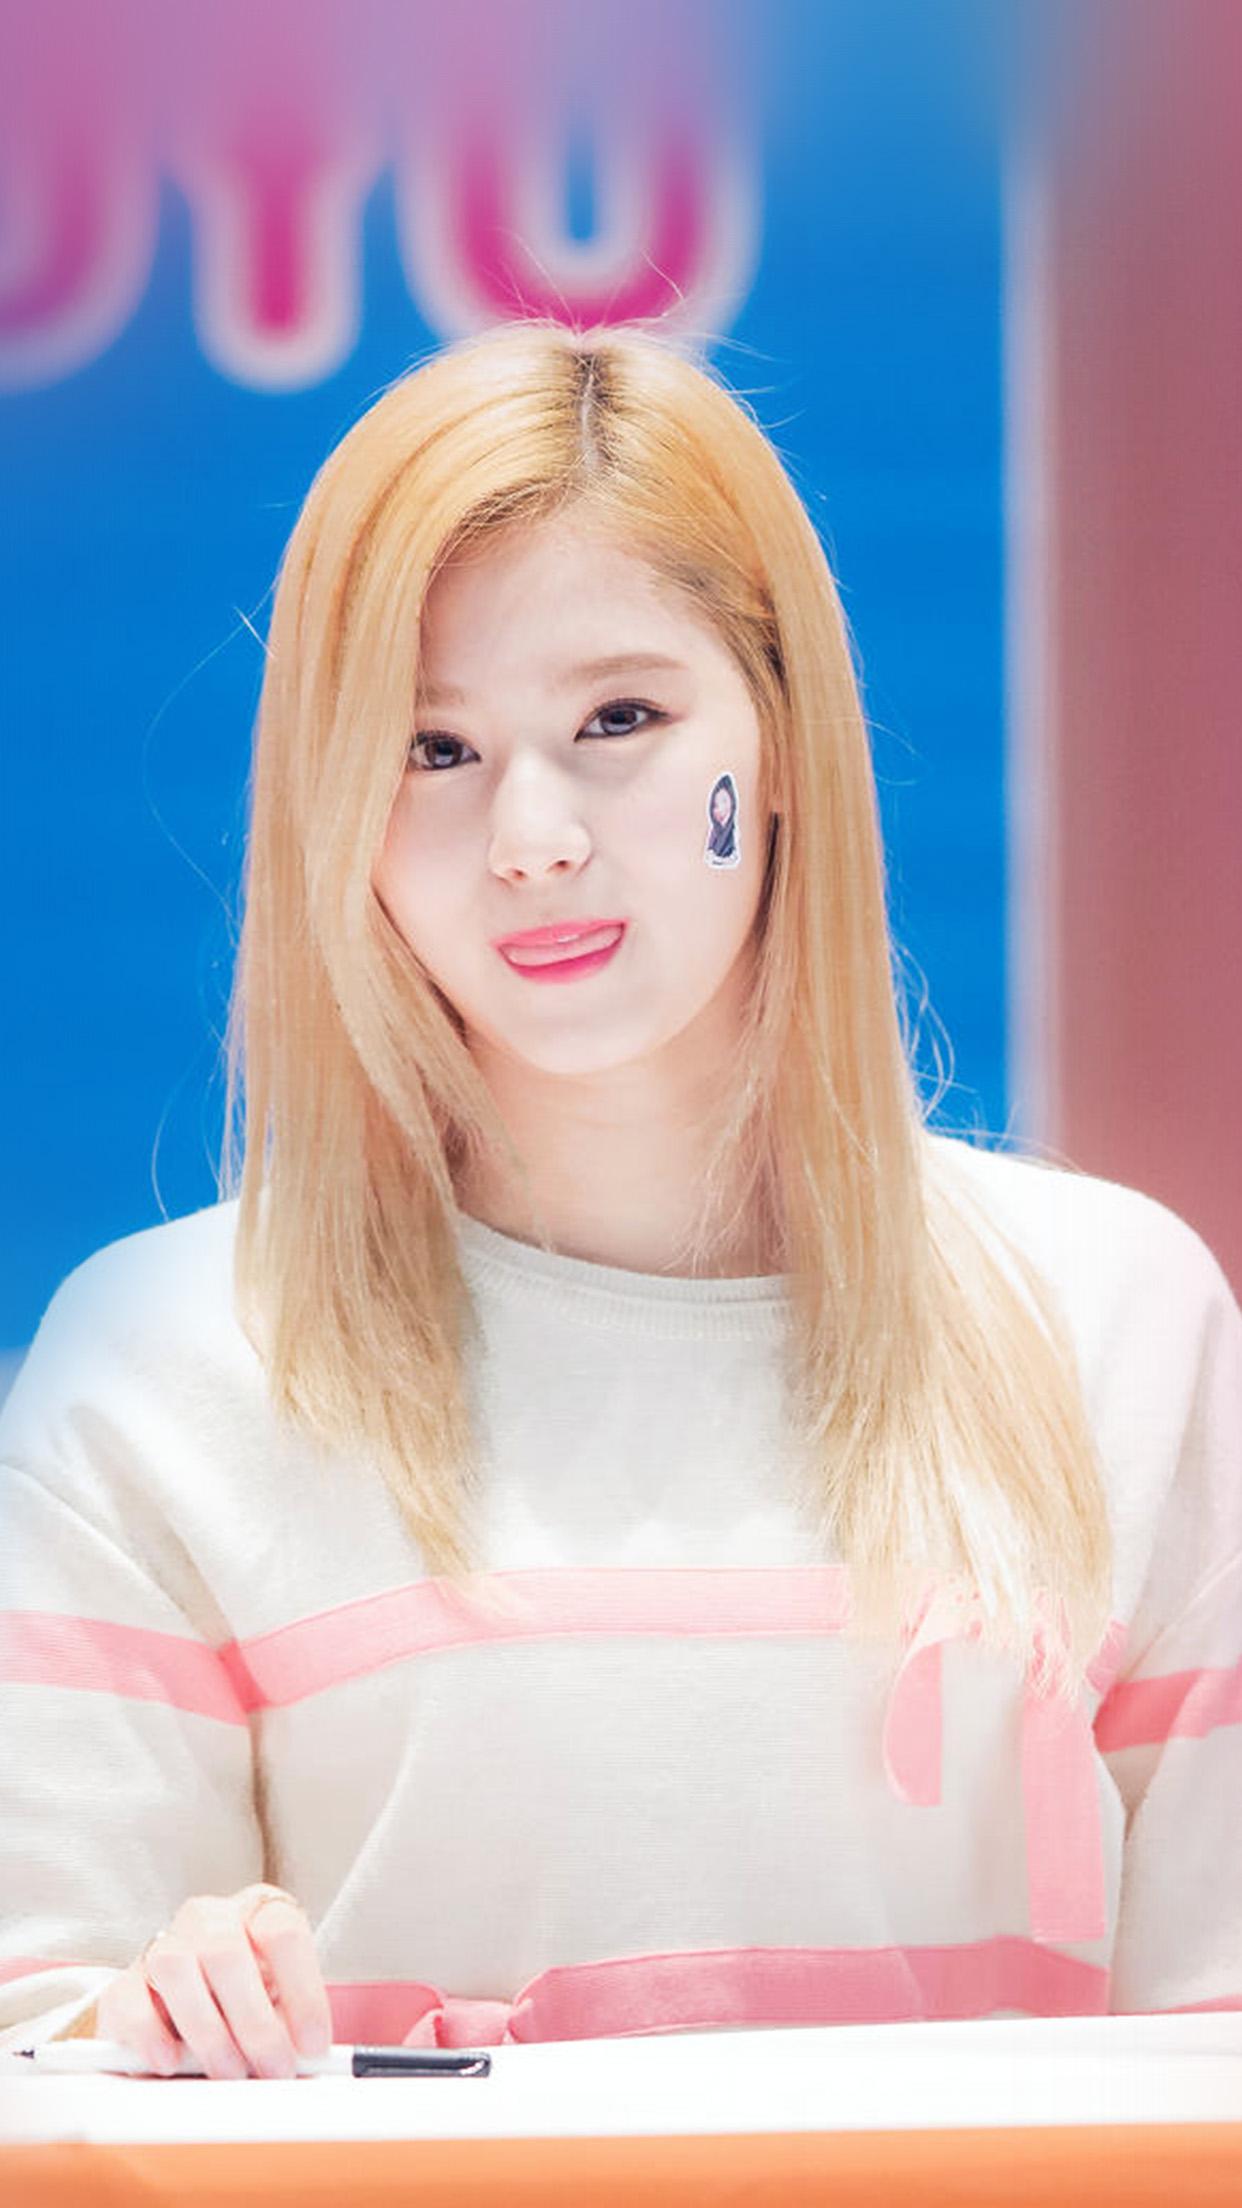 hp73-sana-twice-girl-kpop-group-cute-wallpaper